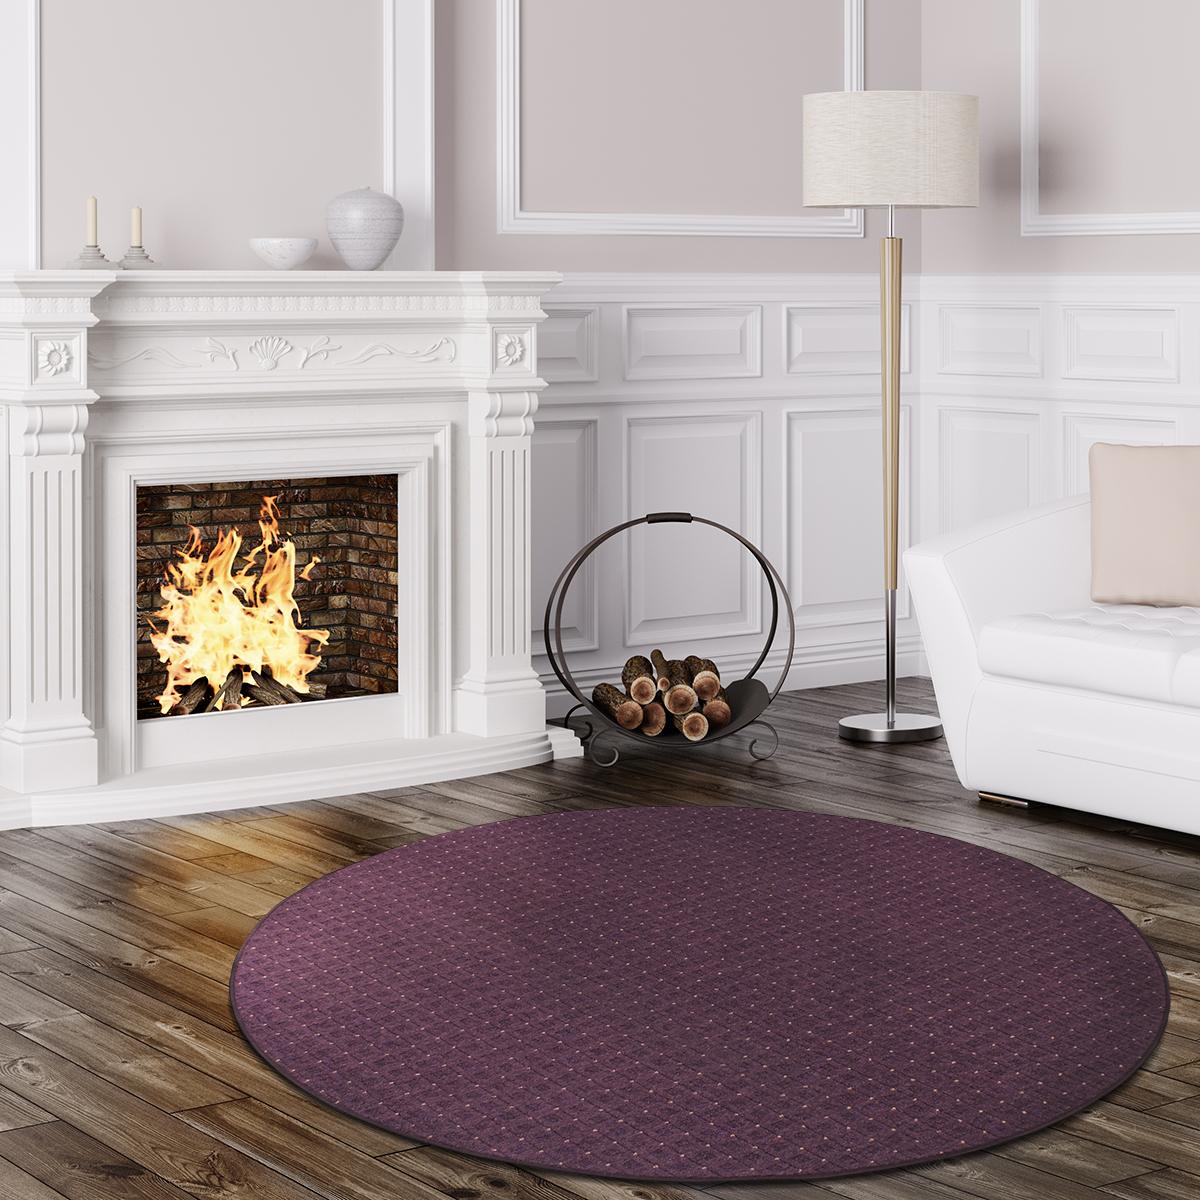 schlingen teppich cambridge rund grau gr n rot lila blau. Black Bedroom Furniture Sets. Home Design Ideas